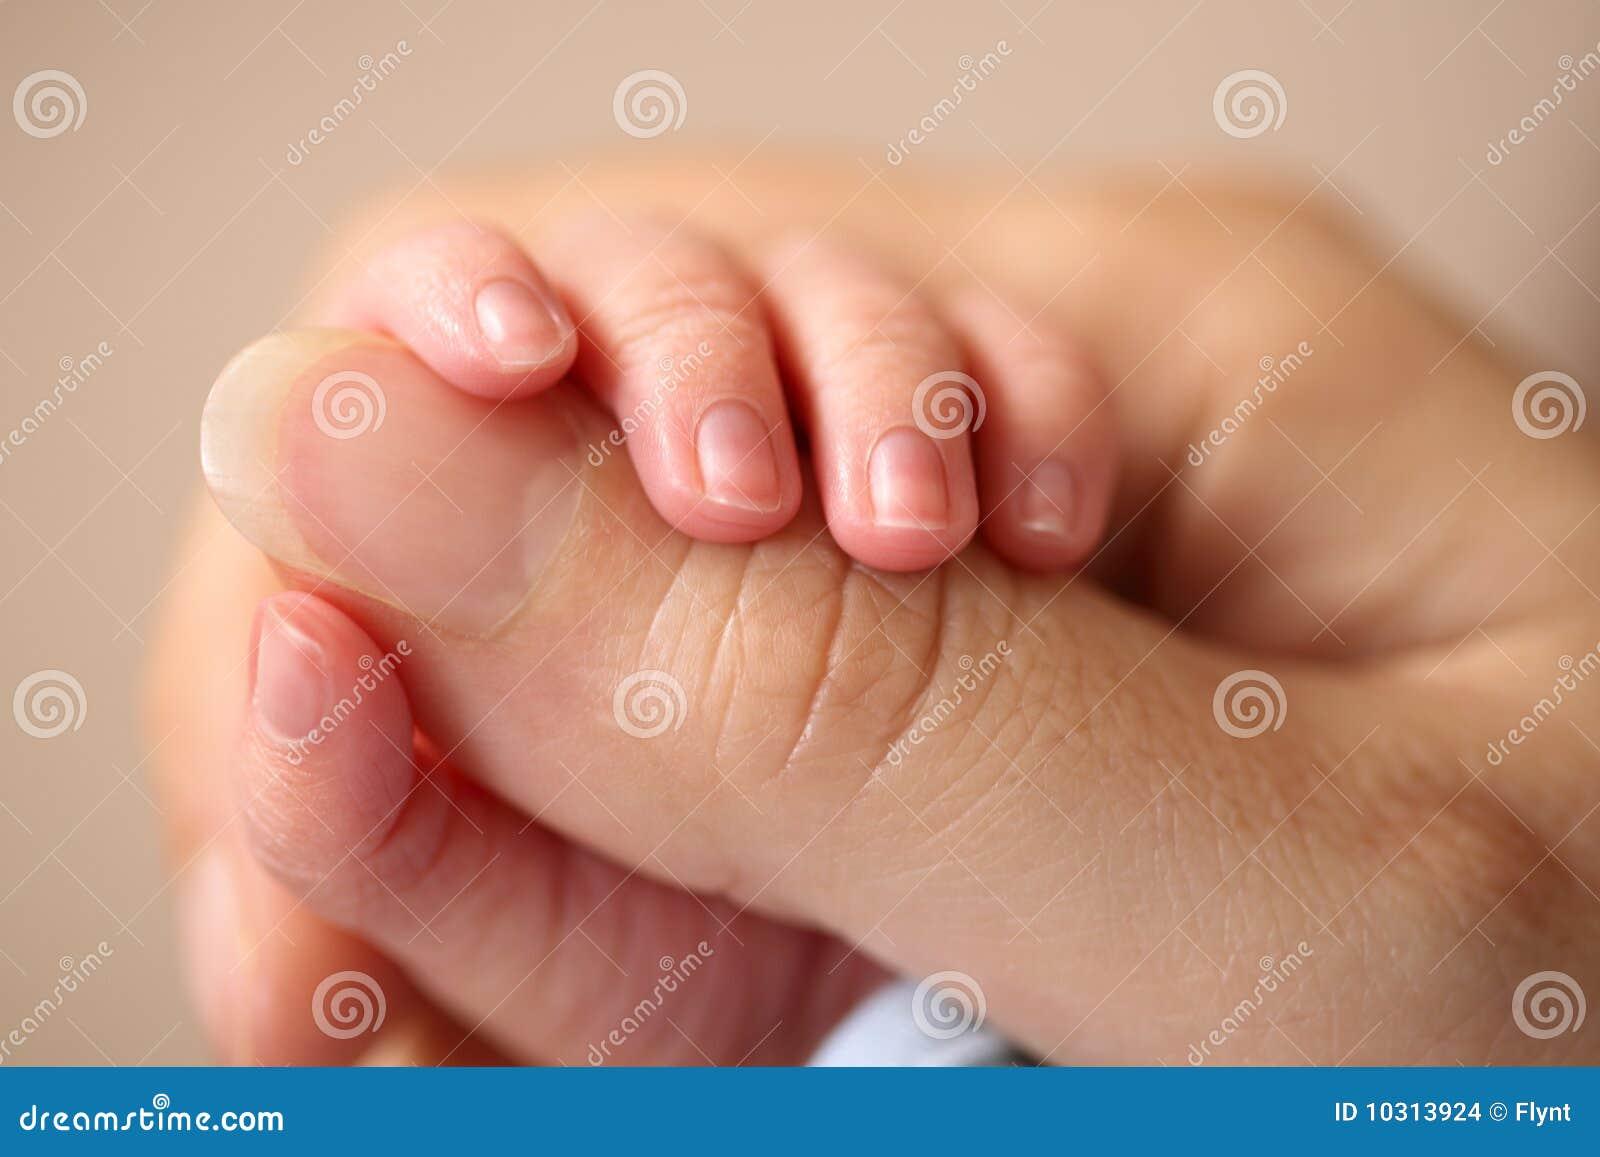 Newborn baby grasps his mother s hand